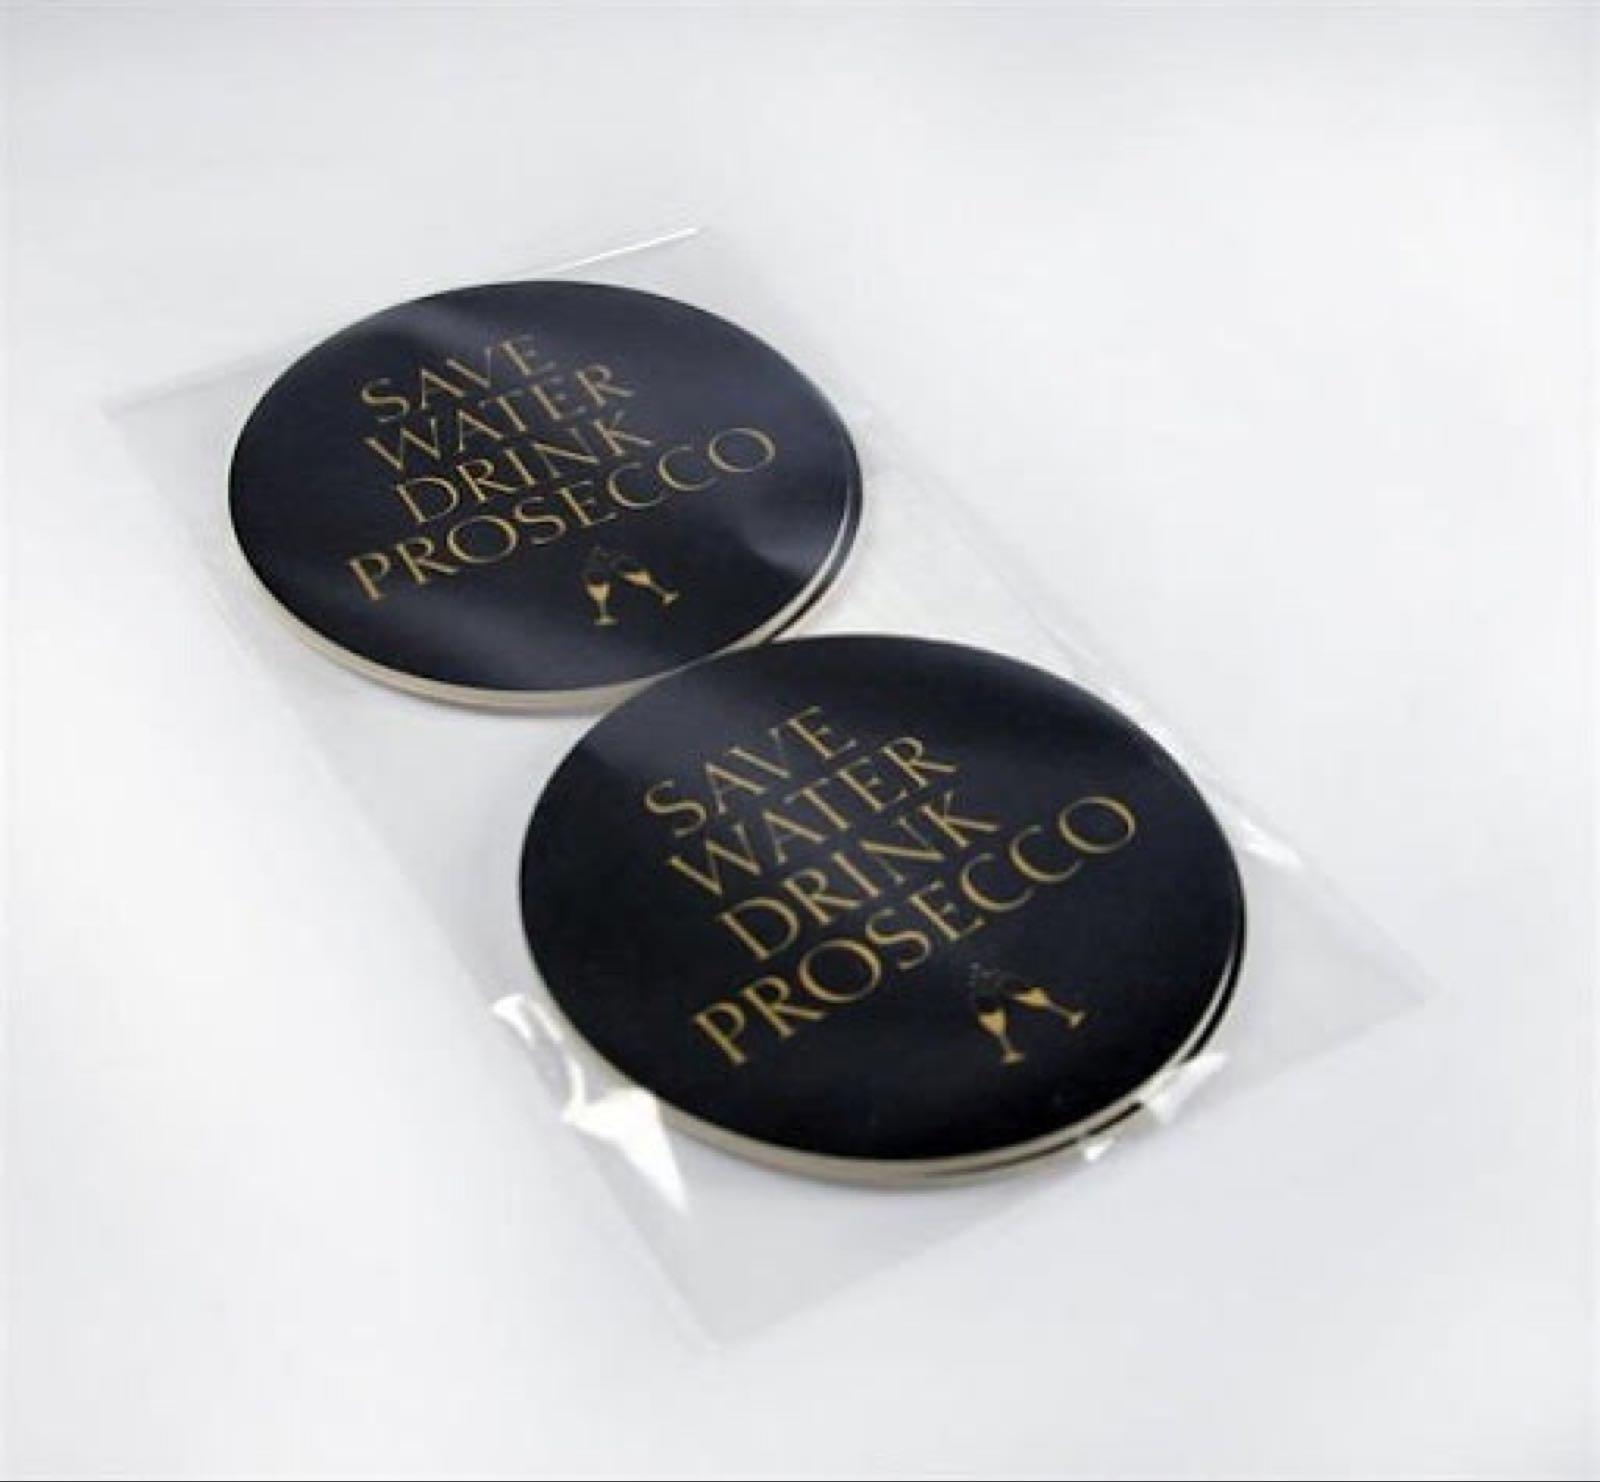 Mellow Design - Glasunderlägg 4-p, Prosecco, svart/guldtext